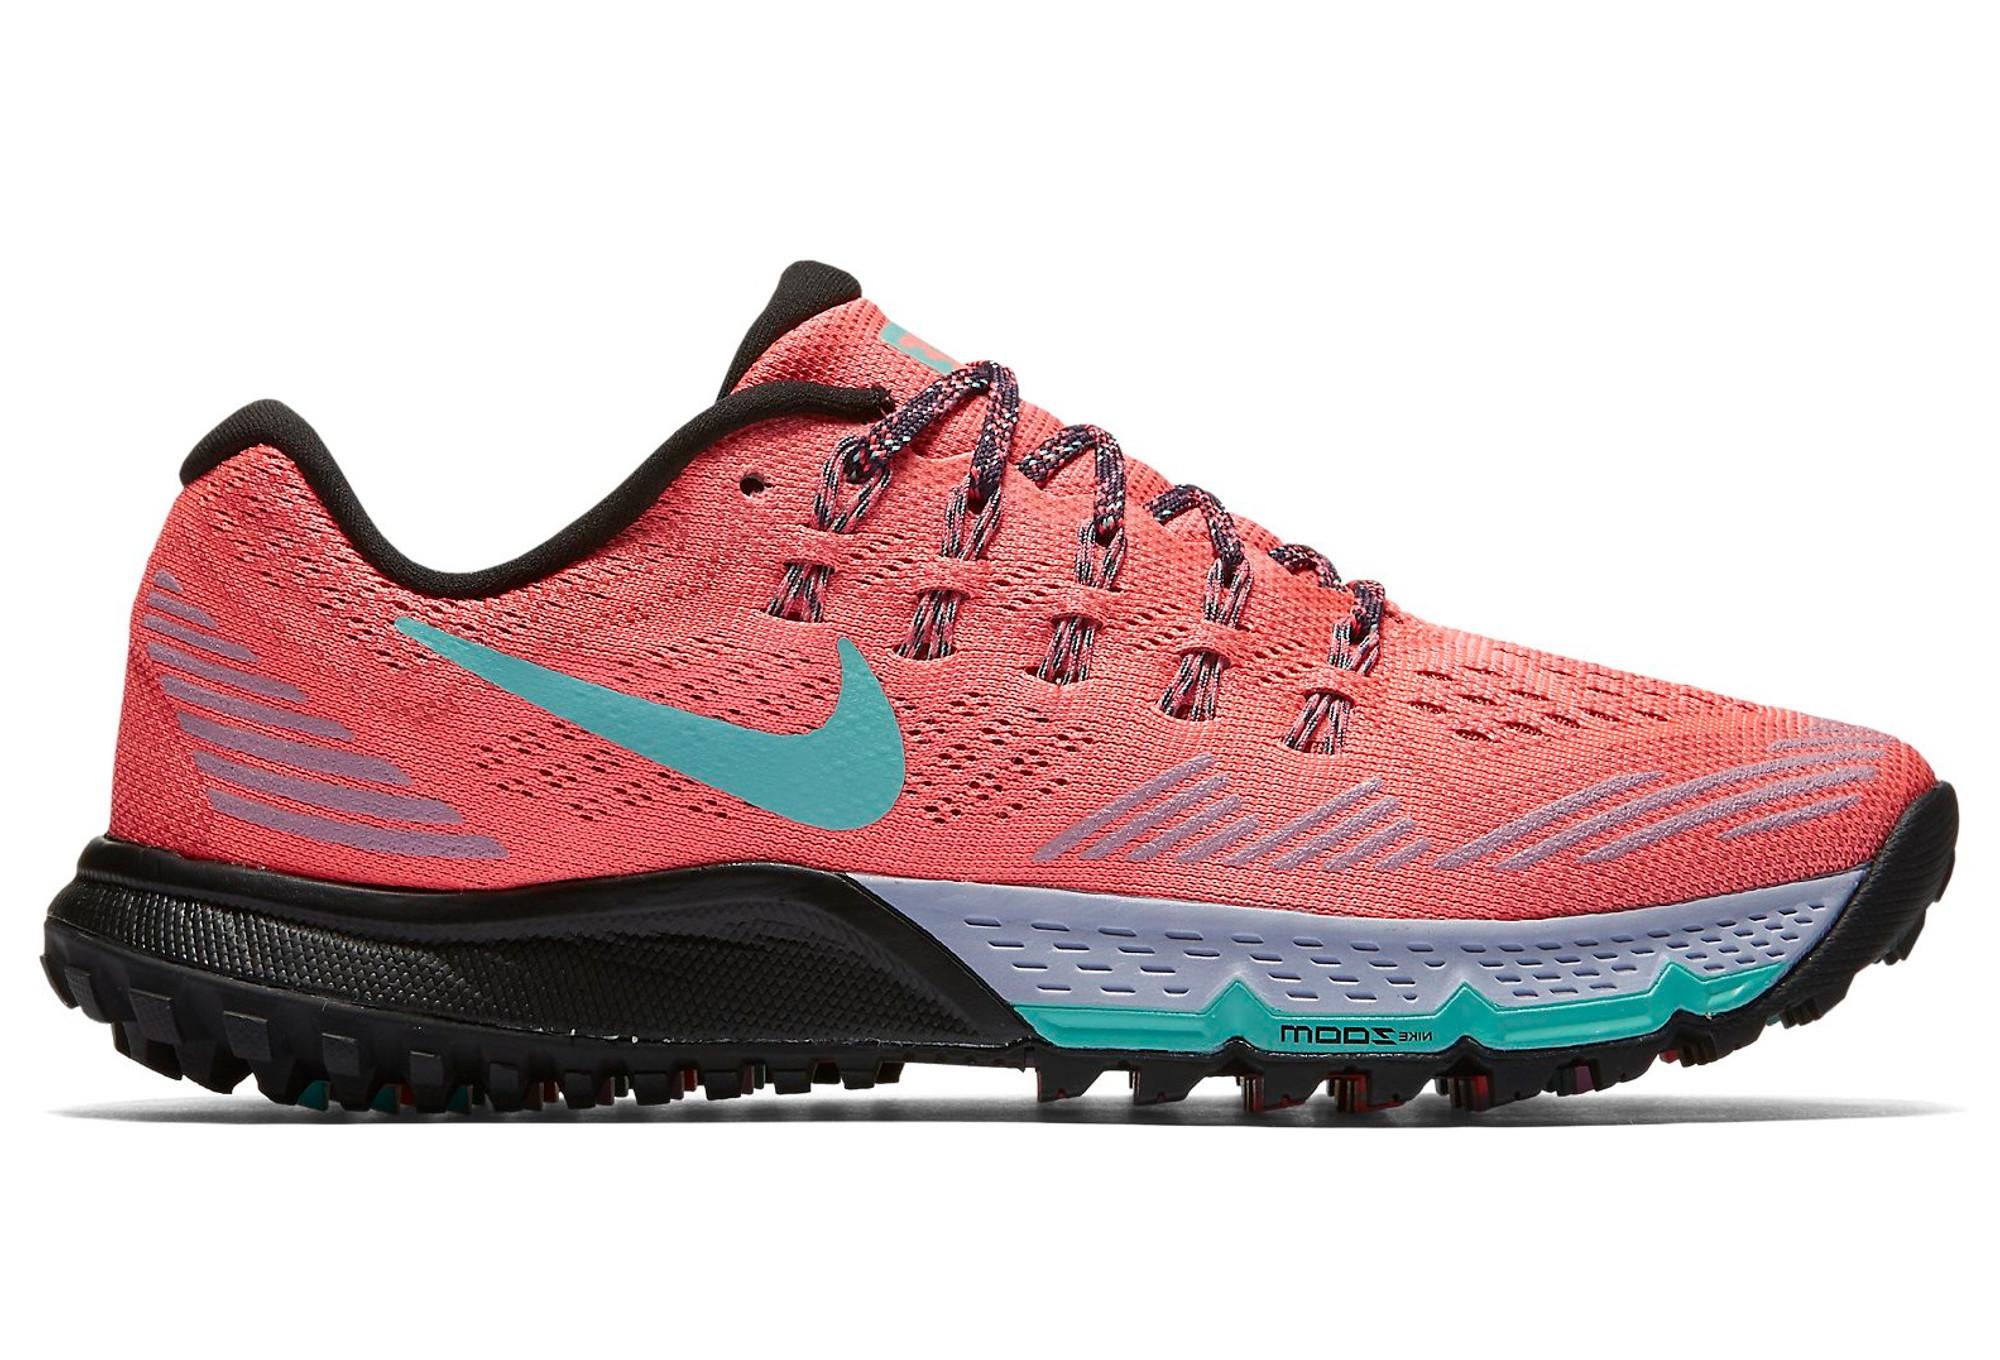 separation shoes 497b4 b277c Chaussures de Trail Femme Nike AIR ZOOM TERRA KIGER 3 Bleu   Orange